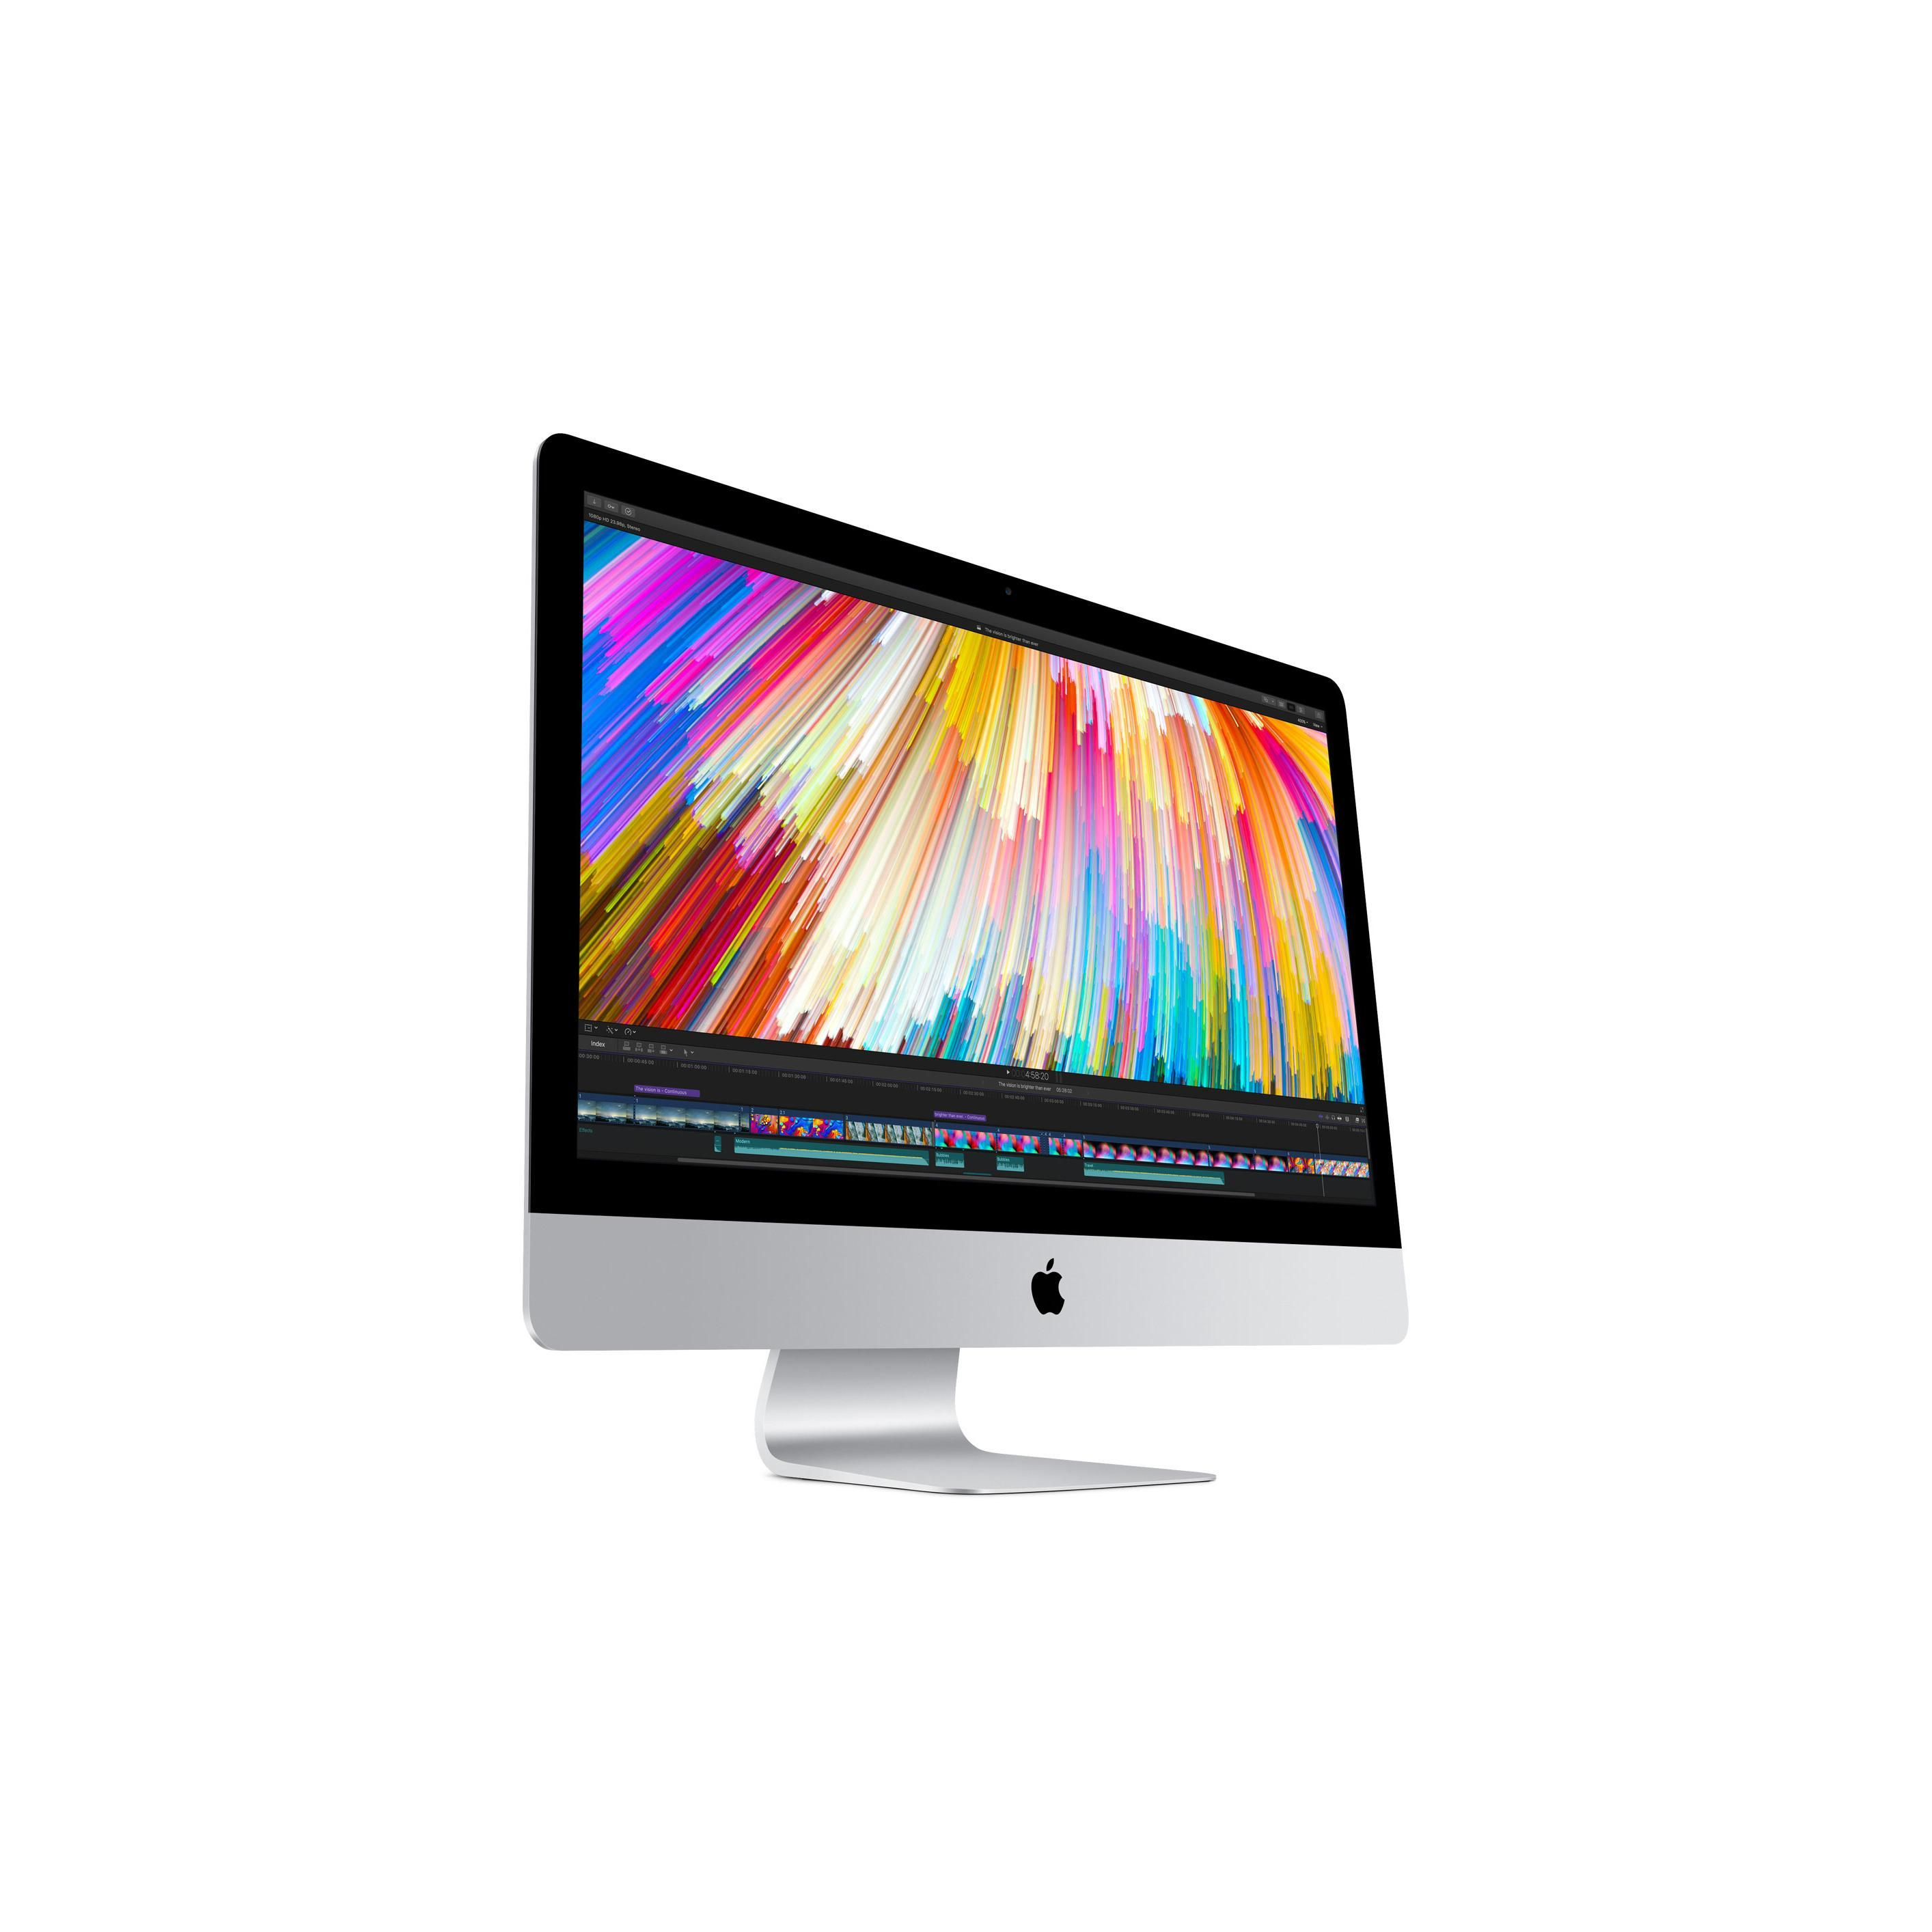 "iMac 27"" 5K (Ende 2015) Core i5 3,2 GHz  - SSD 30 GB + HDD 1 TB - 16GB AZERTY - Französisch"